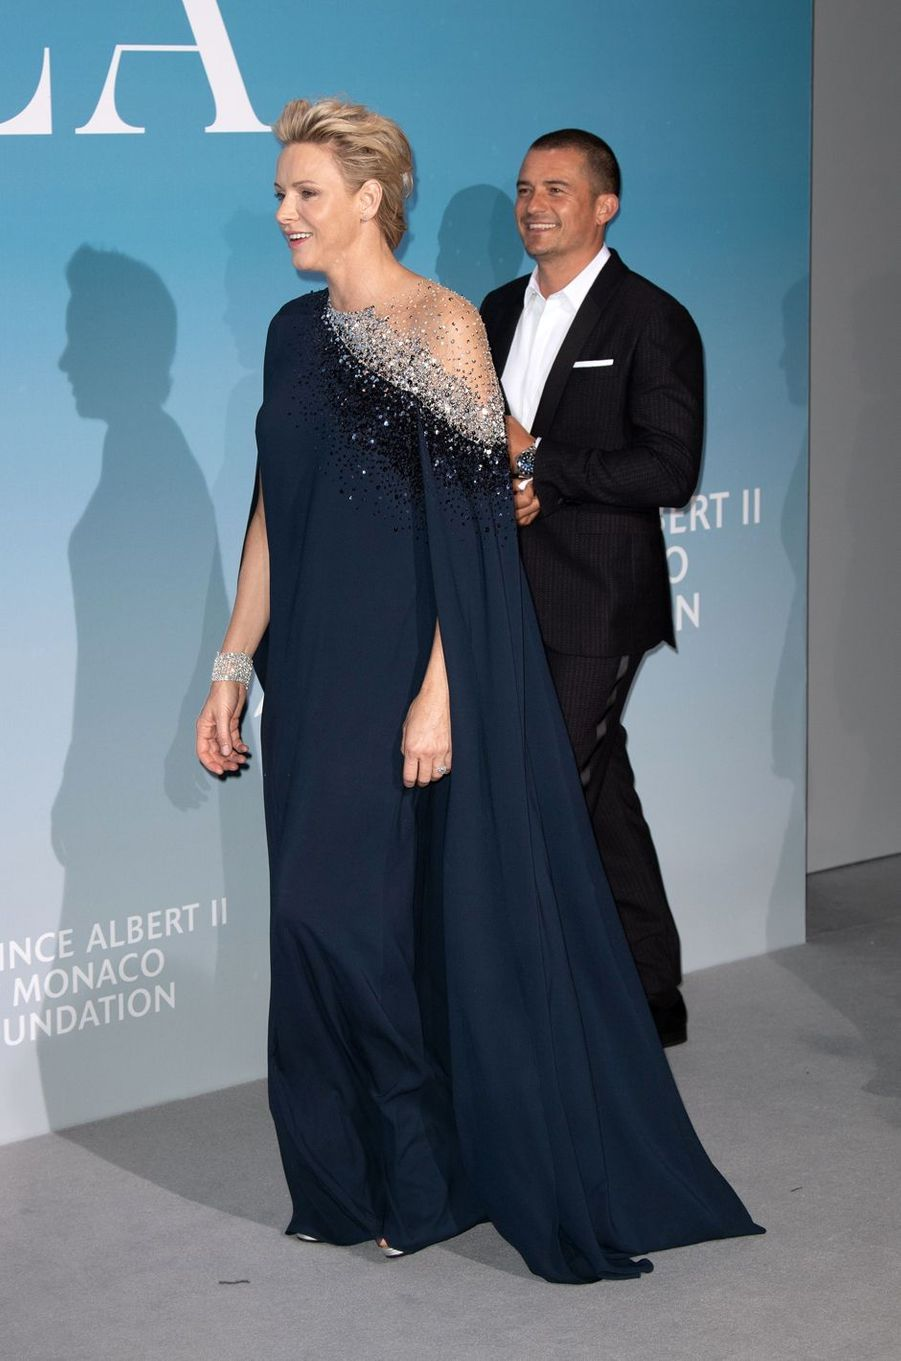 La princesse Charlène de Monaco dans une robe Oscar de la Renta à Monaco, le 26 septembre 2018